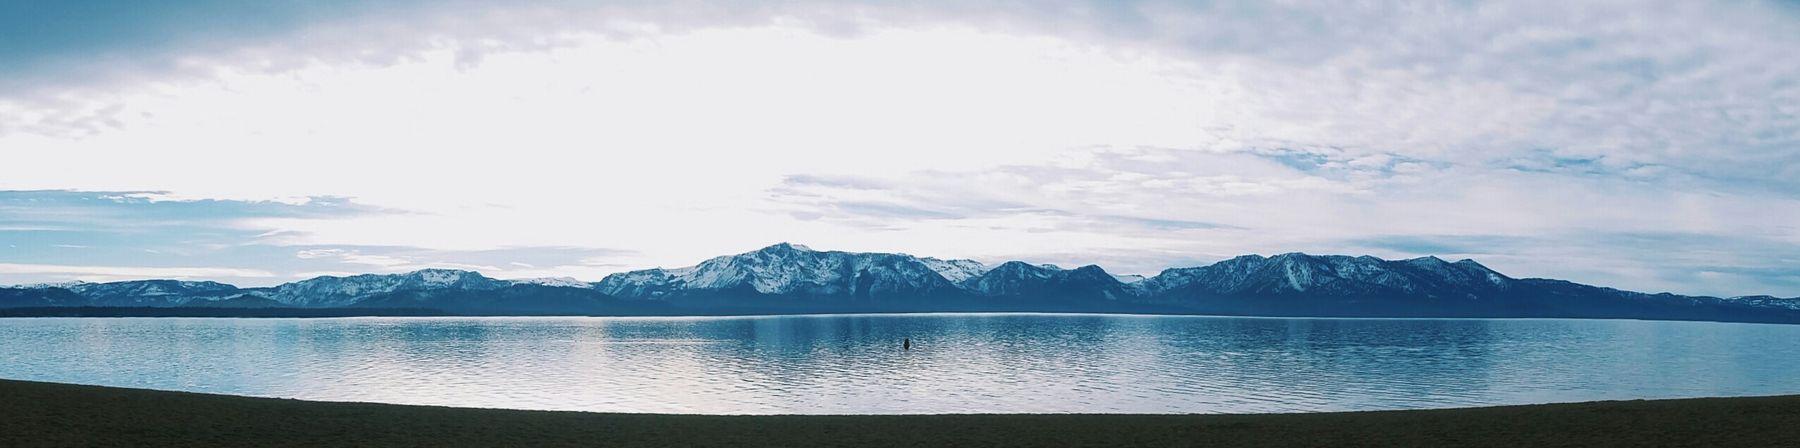 Regan Beach, South Lake Tahoe